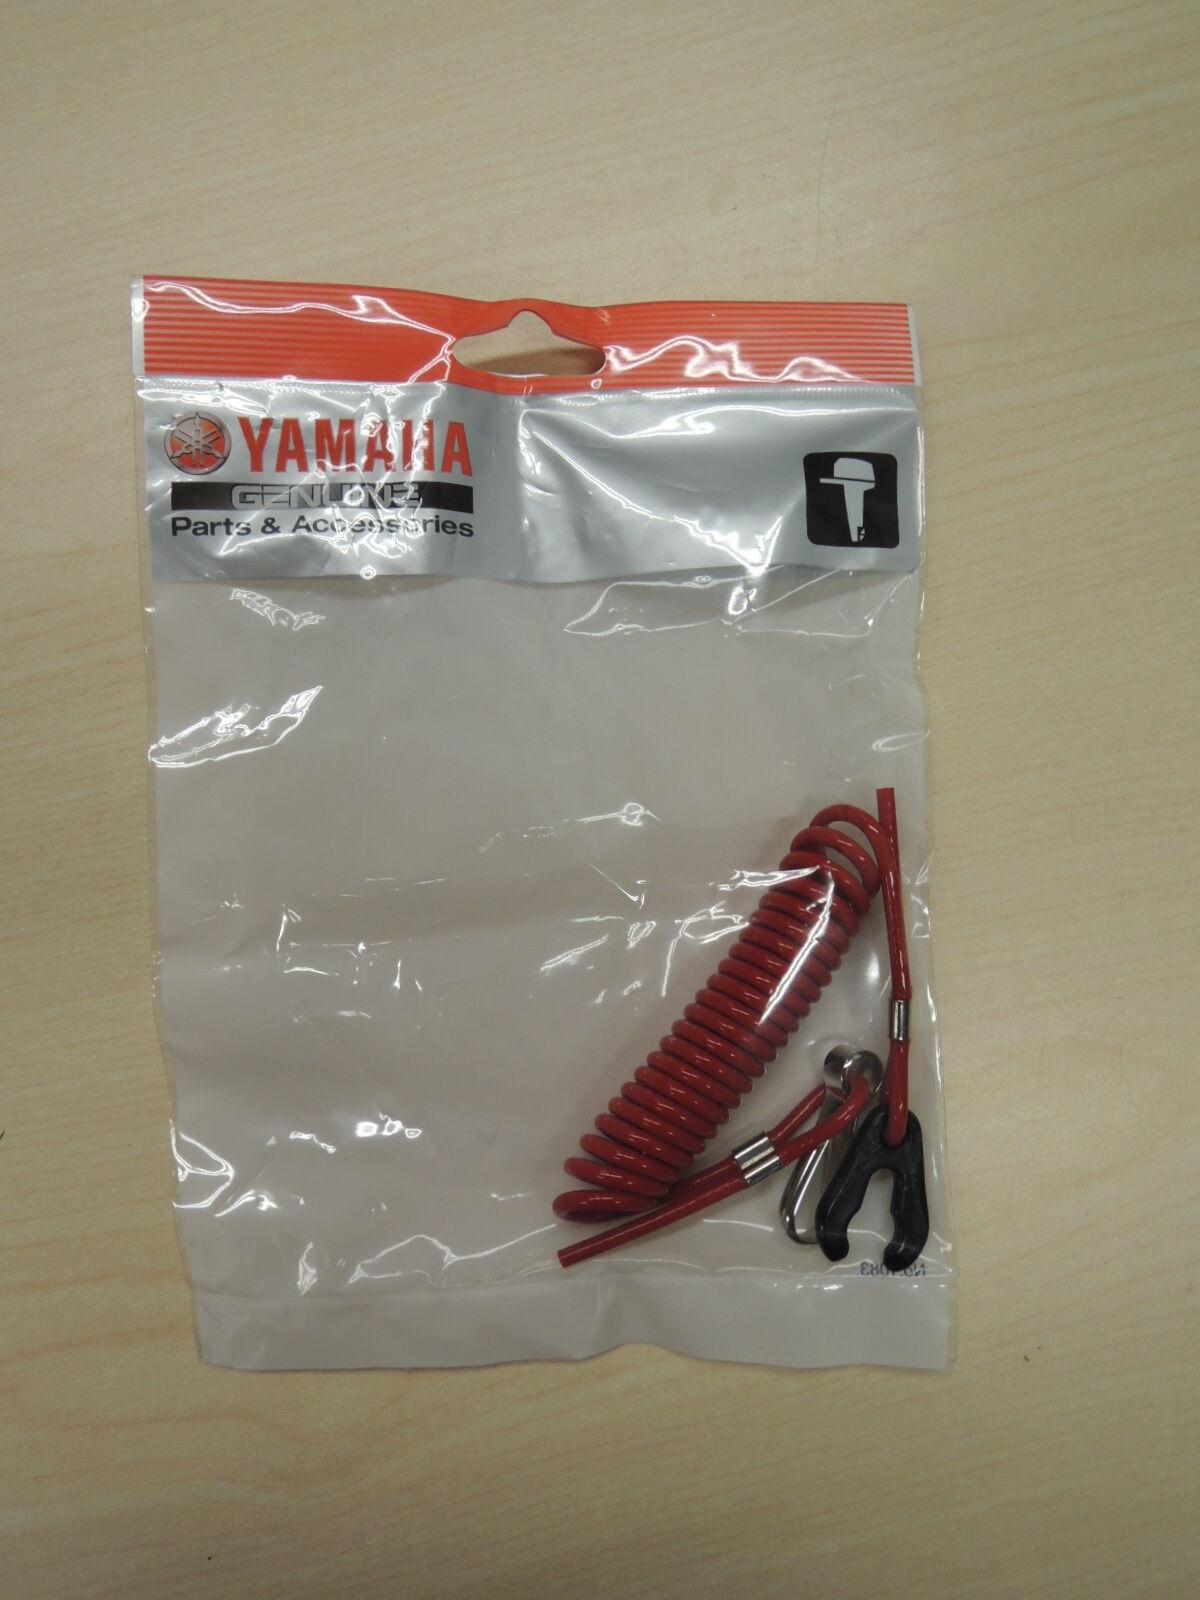 NOS YAMAHA 682-82556-00-00 EMERGENCY STOP LANYARD EXT100 ESE1200 XRT1200